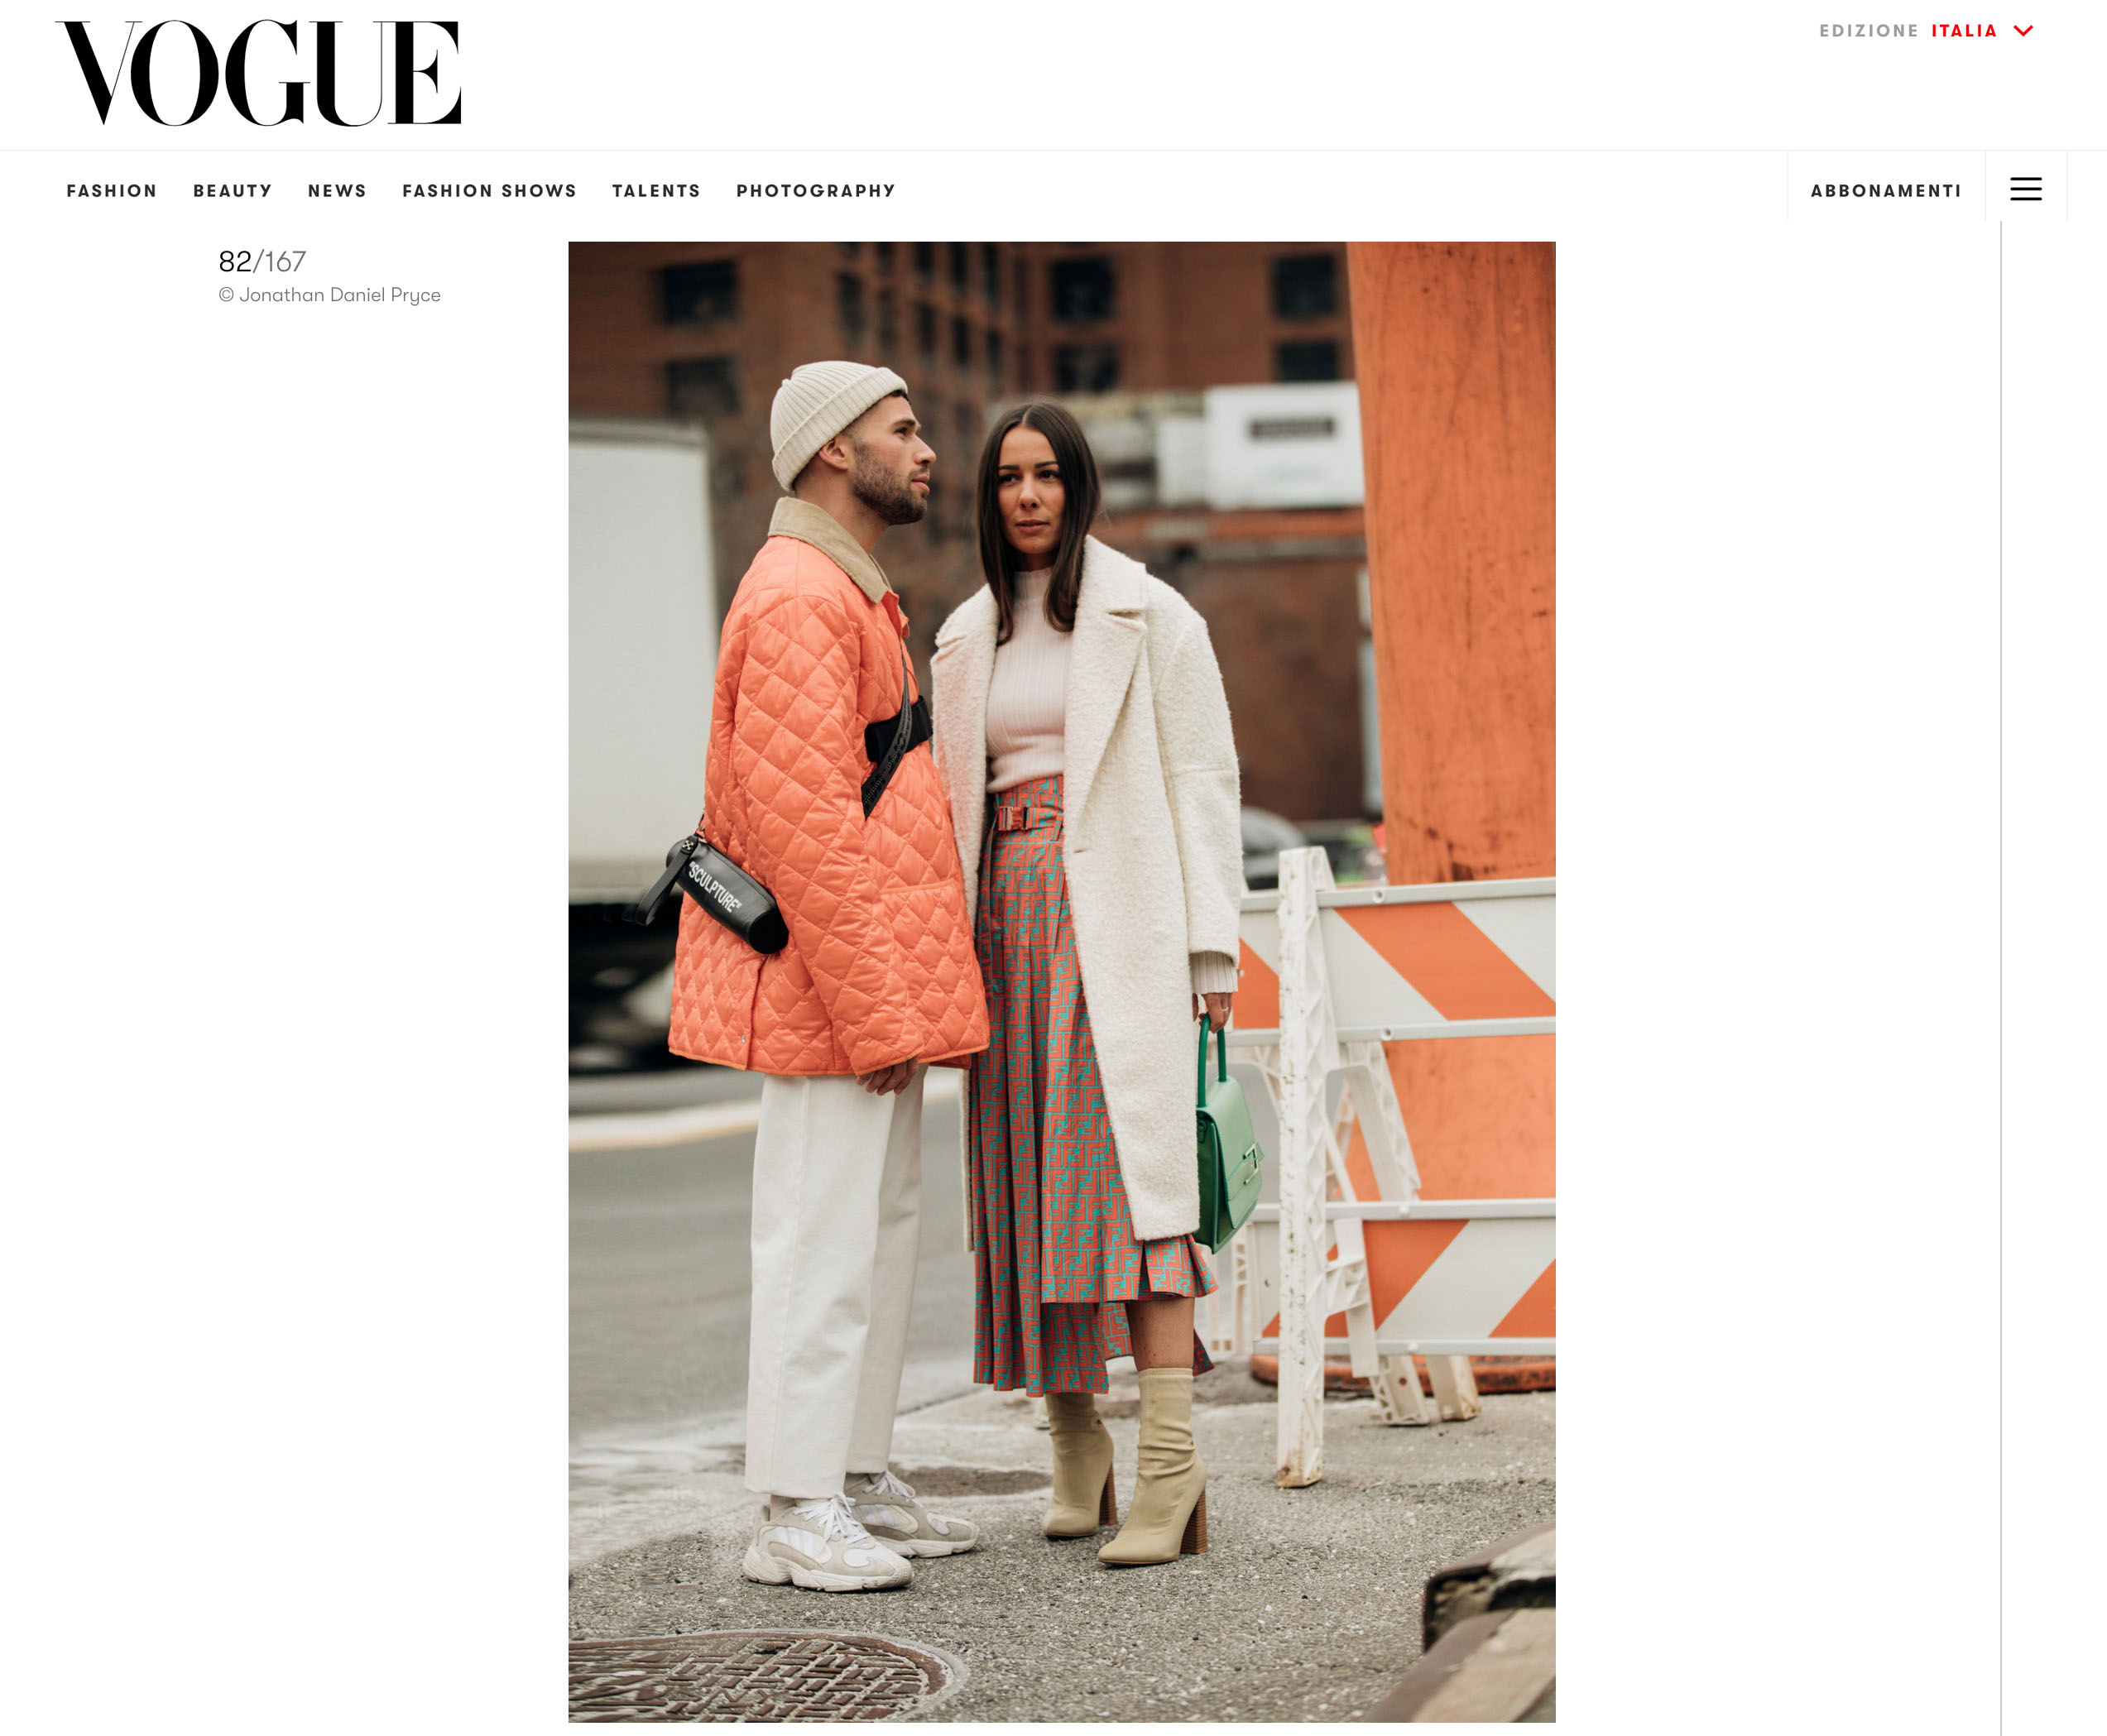 df12487d719 vogue italia street style fashion couple